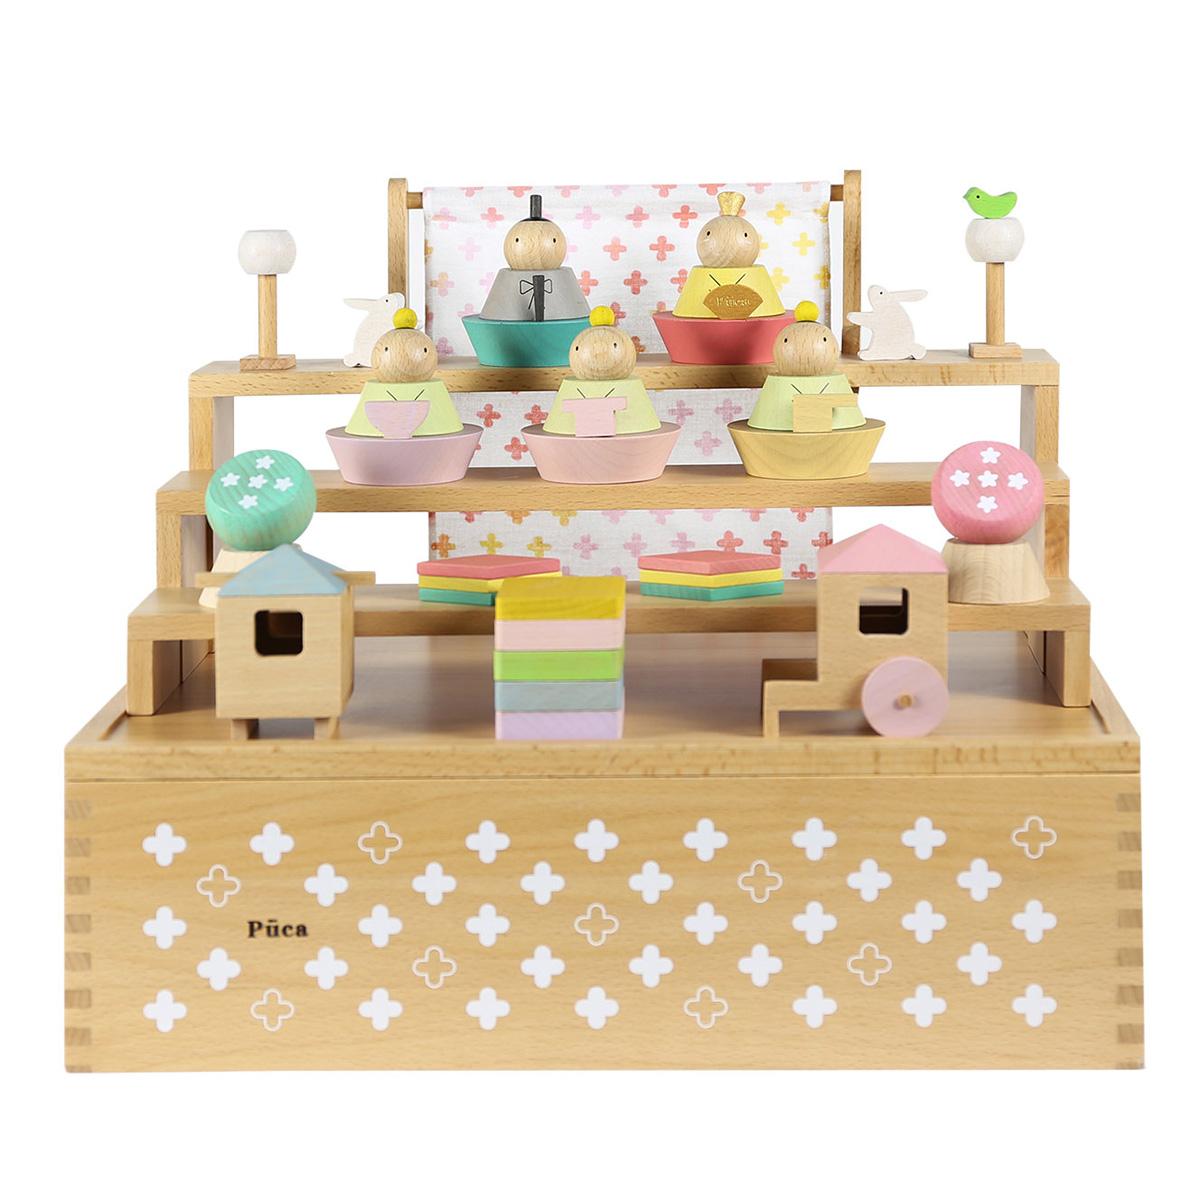 Puca HAKO 積み木 木製 雛人形 プーカのひな人形収納箱 送料無料